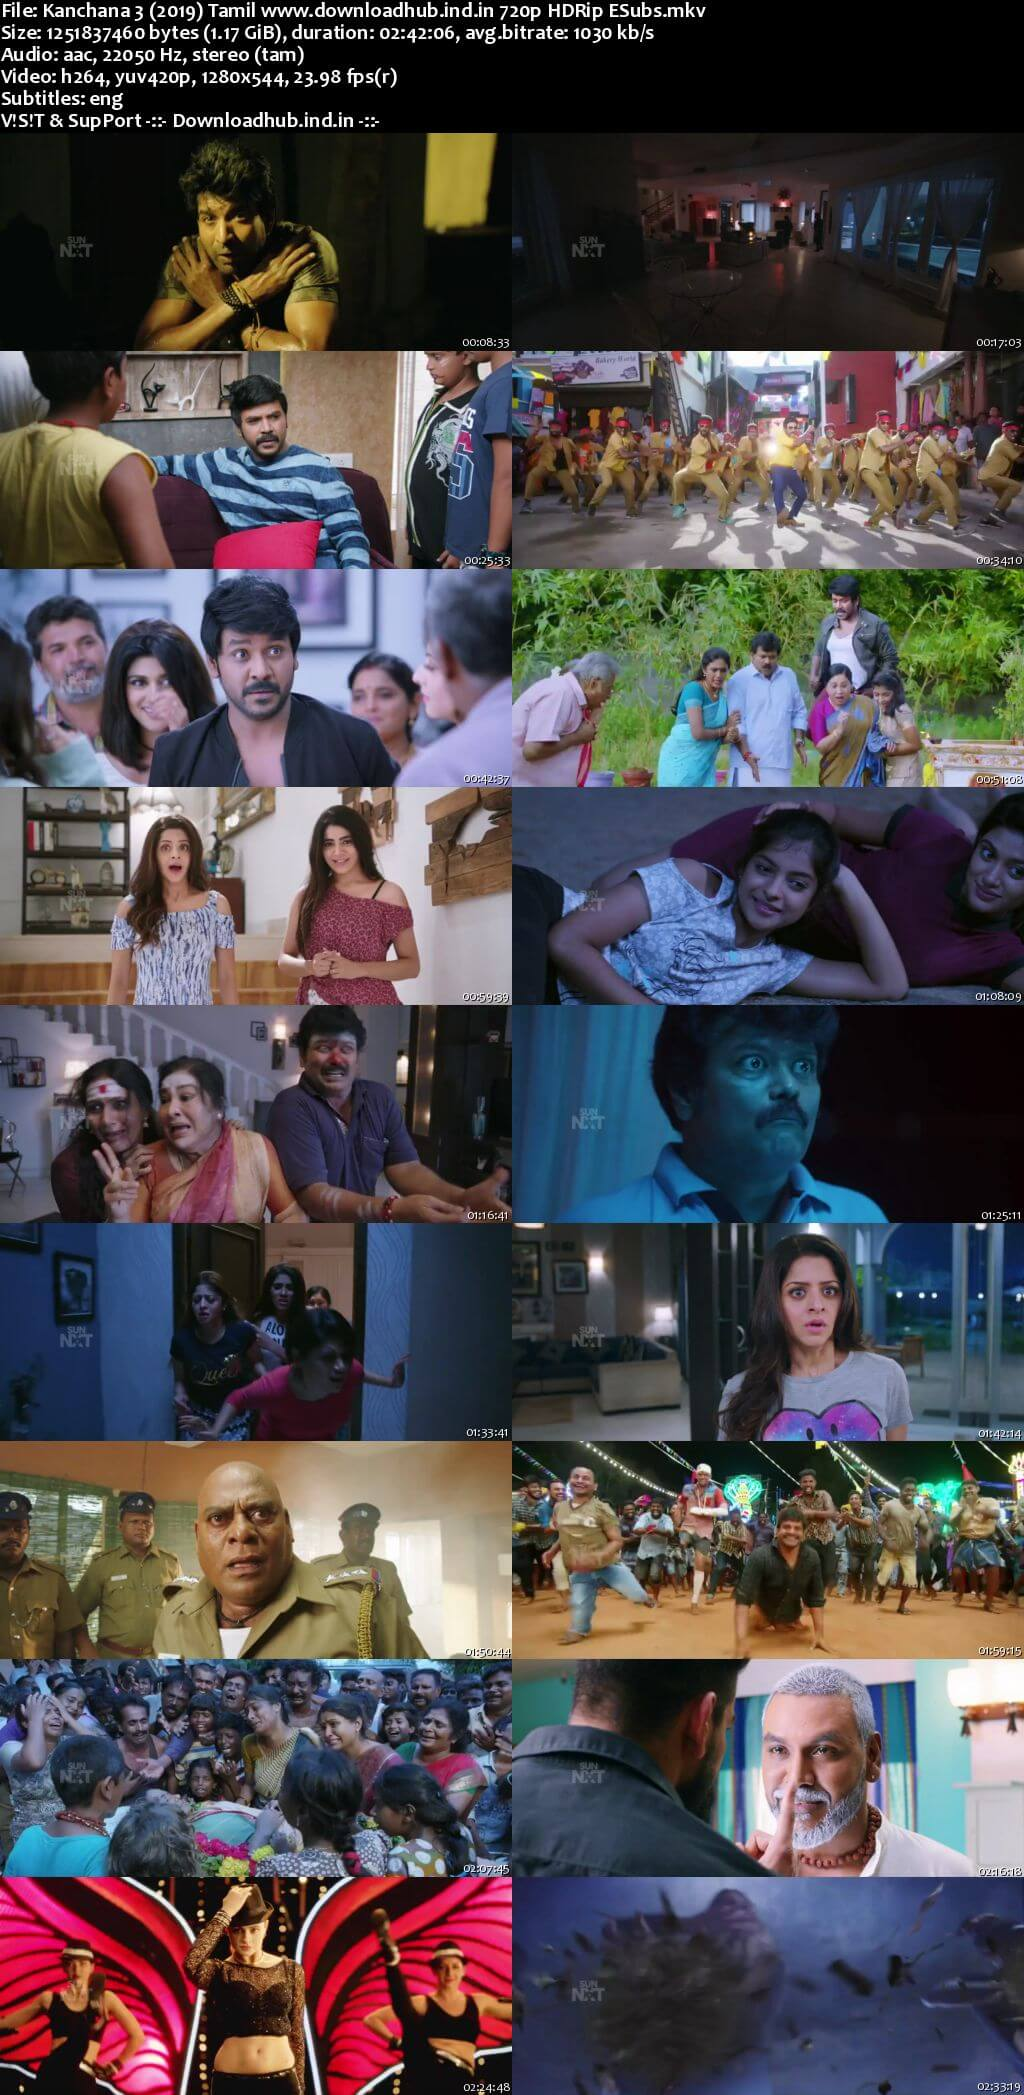 Kanchana 3 2019 Tamil 720p HDRip ESubs